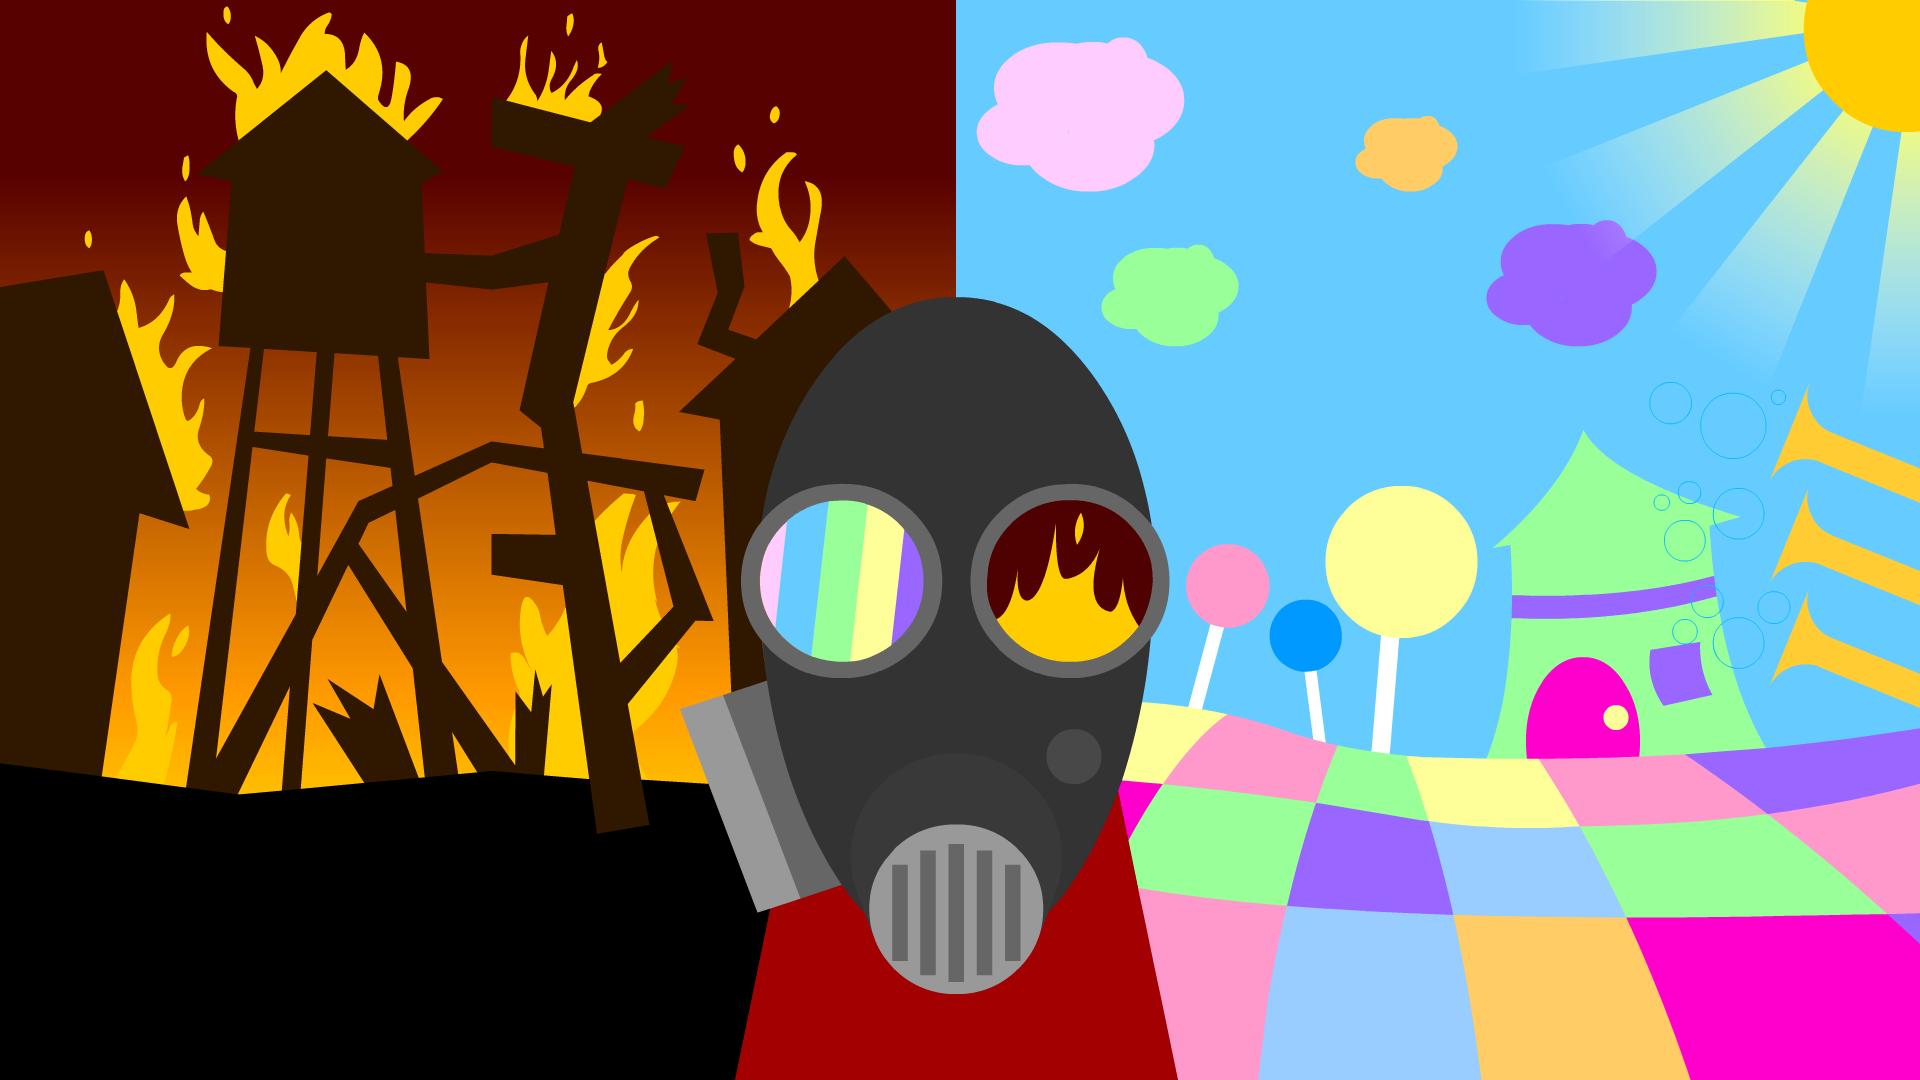 Tf2 meet the pyro wallpaper